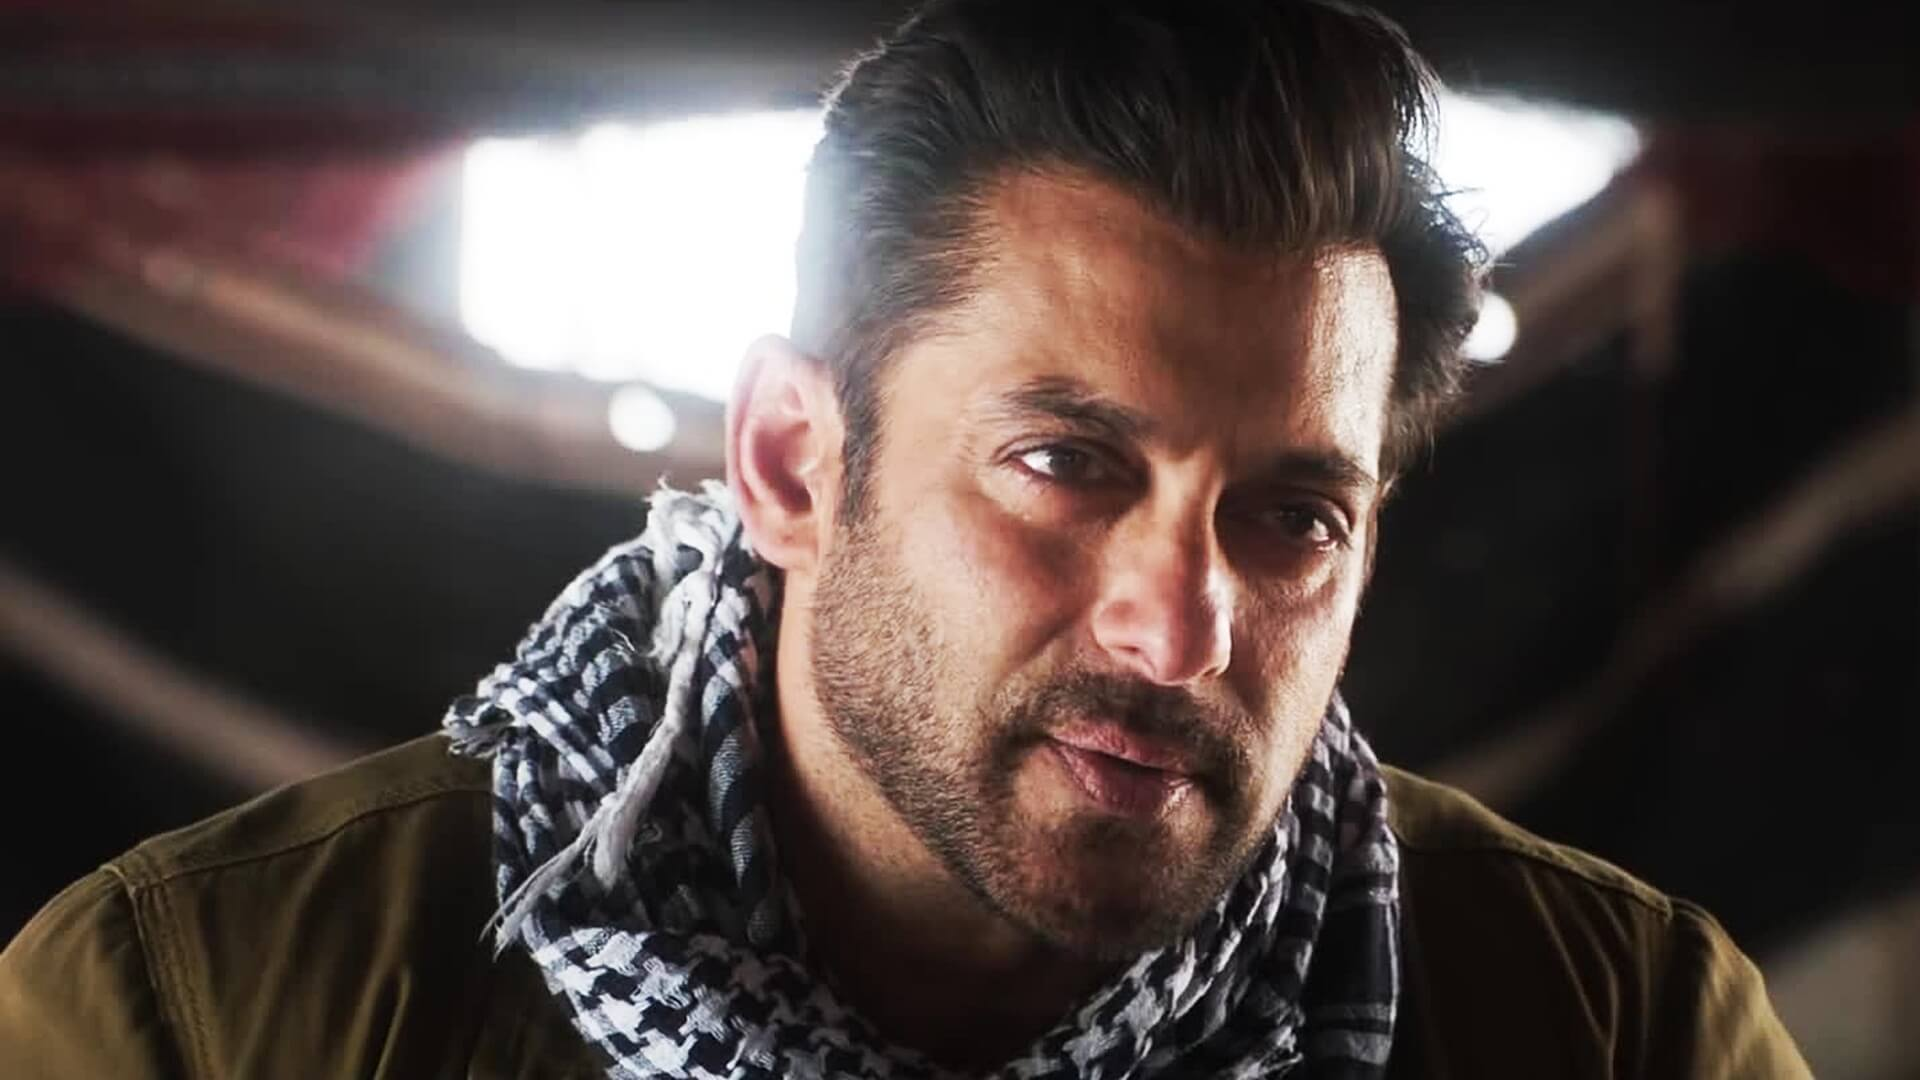 Salman Khan Photo, Age, News, Birthday, Height, Sister, Biography, Girlfriend, Awards, Address, Song, Video, Net Worth, Education, Twitter, Instagram, Facebook, Wiki, Imdb, Website, Youtube (48)